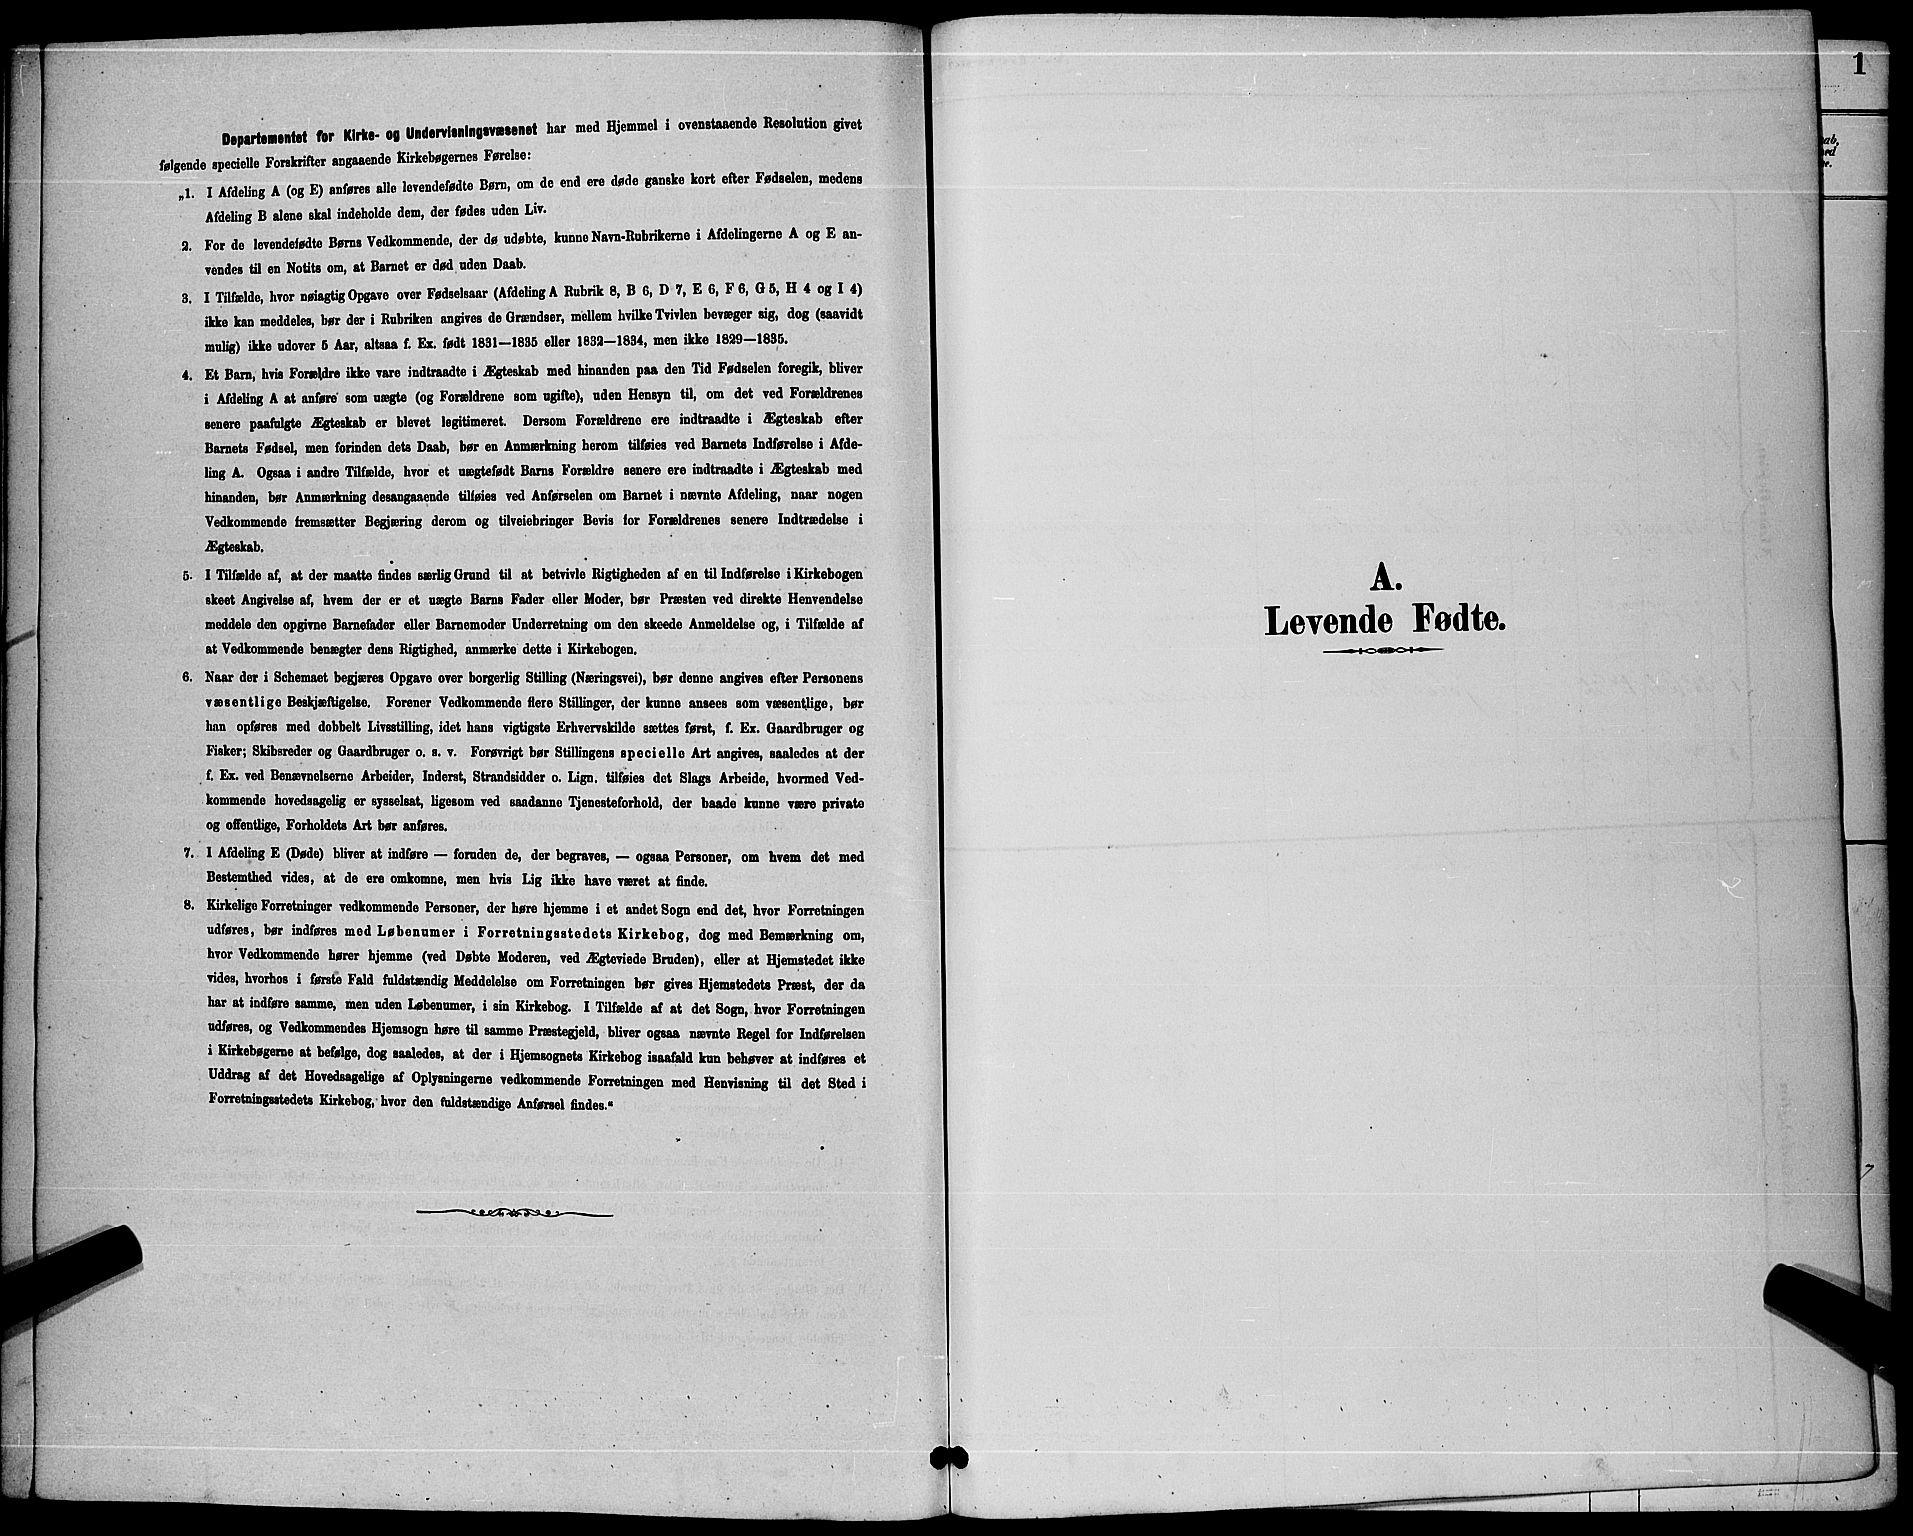 SAKO, Sandefjord kirkebøker, G/Ga/L0001: Klokkerbok nr. 1, 1885-1903